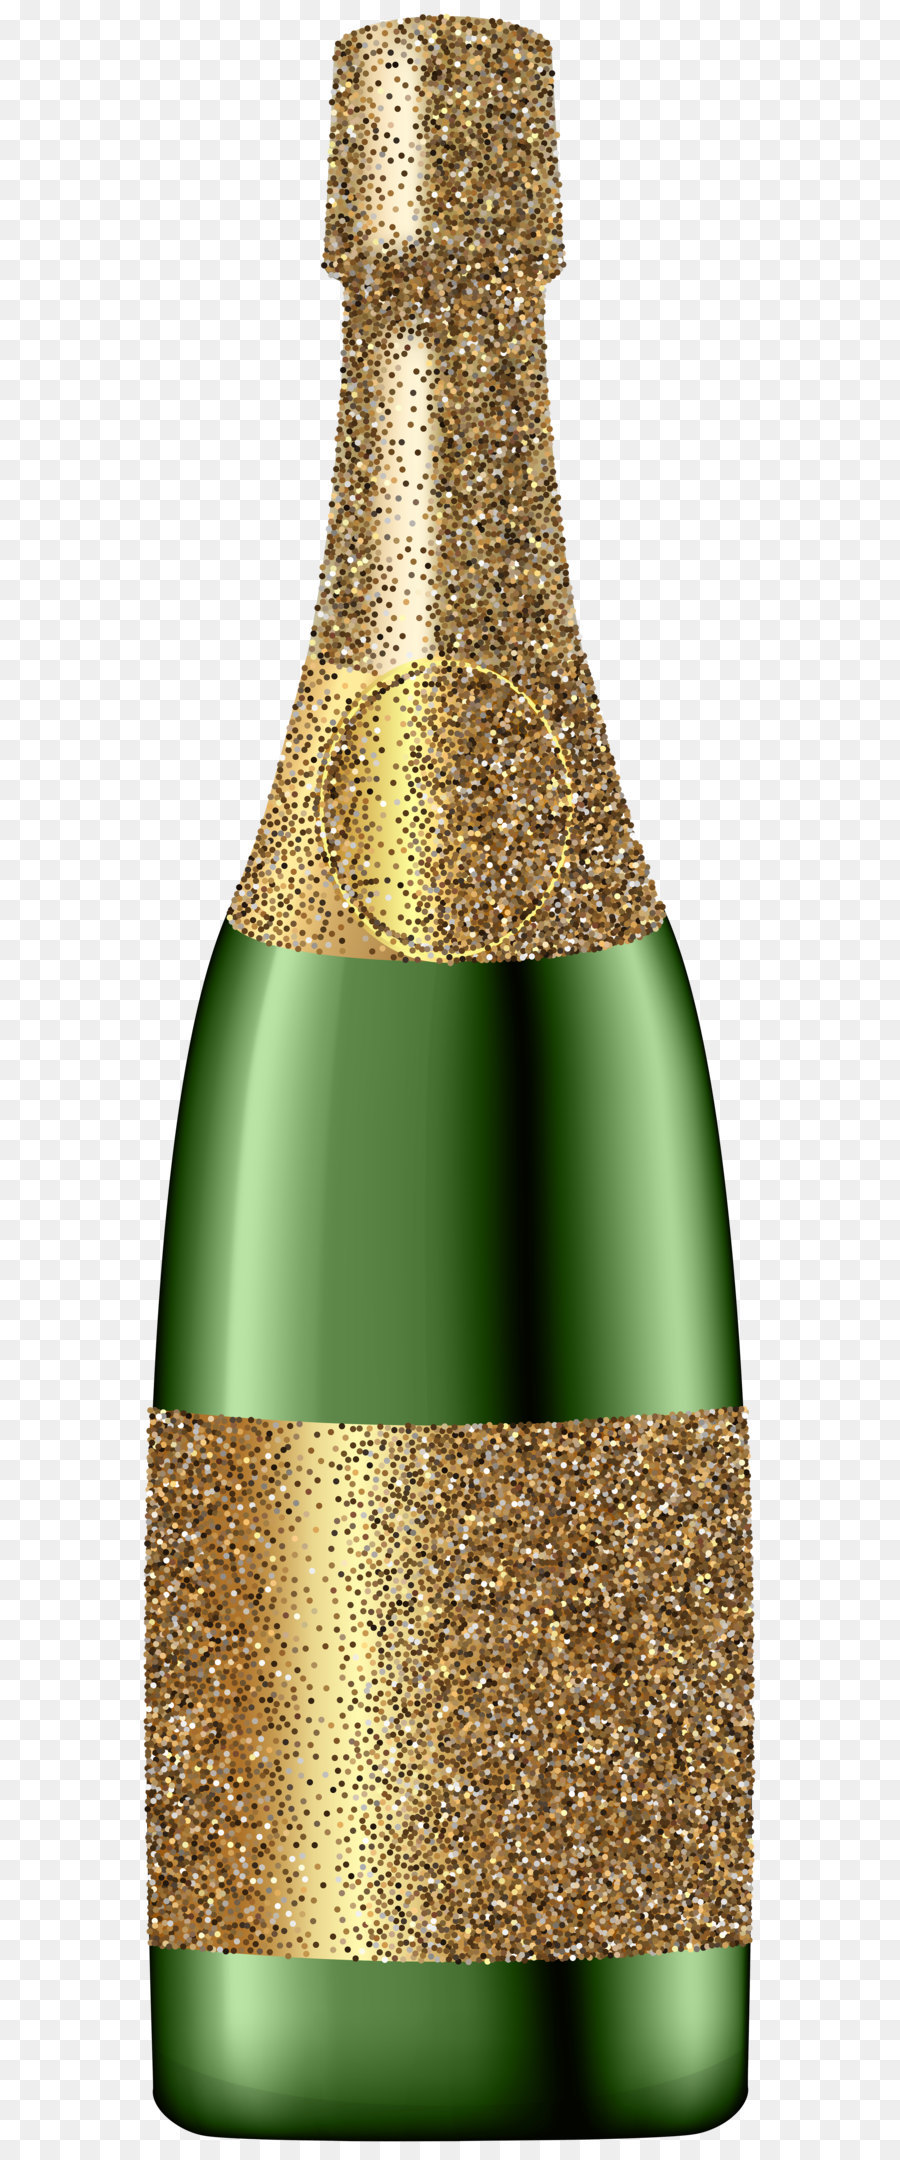 Champagne clipart glitter. Red wine bottle clip